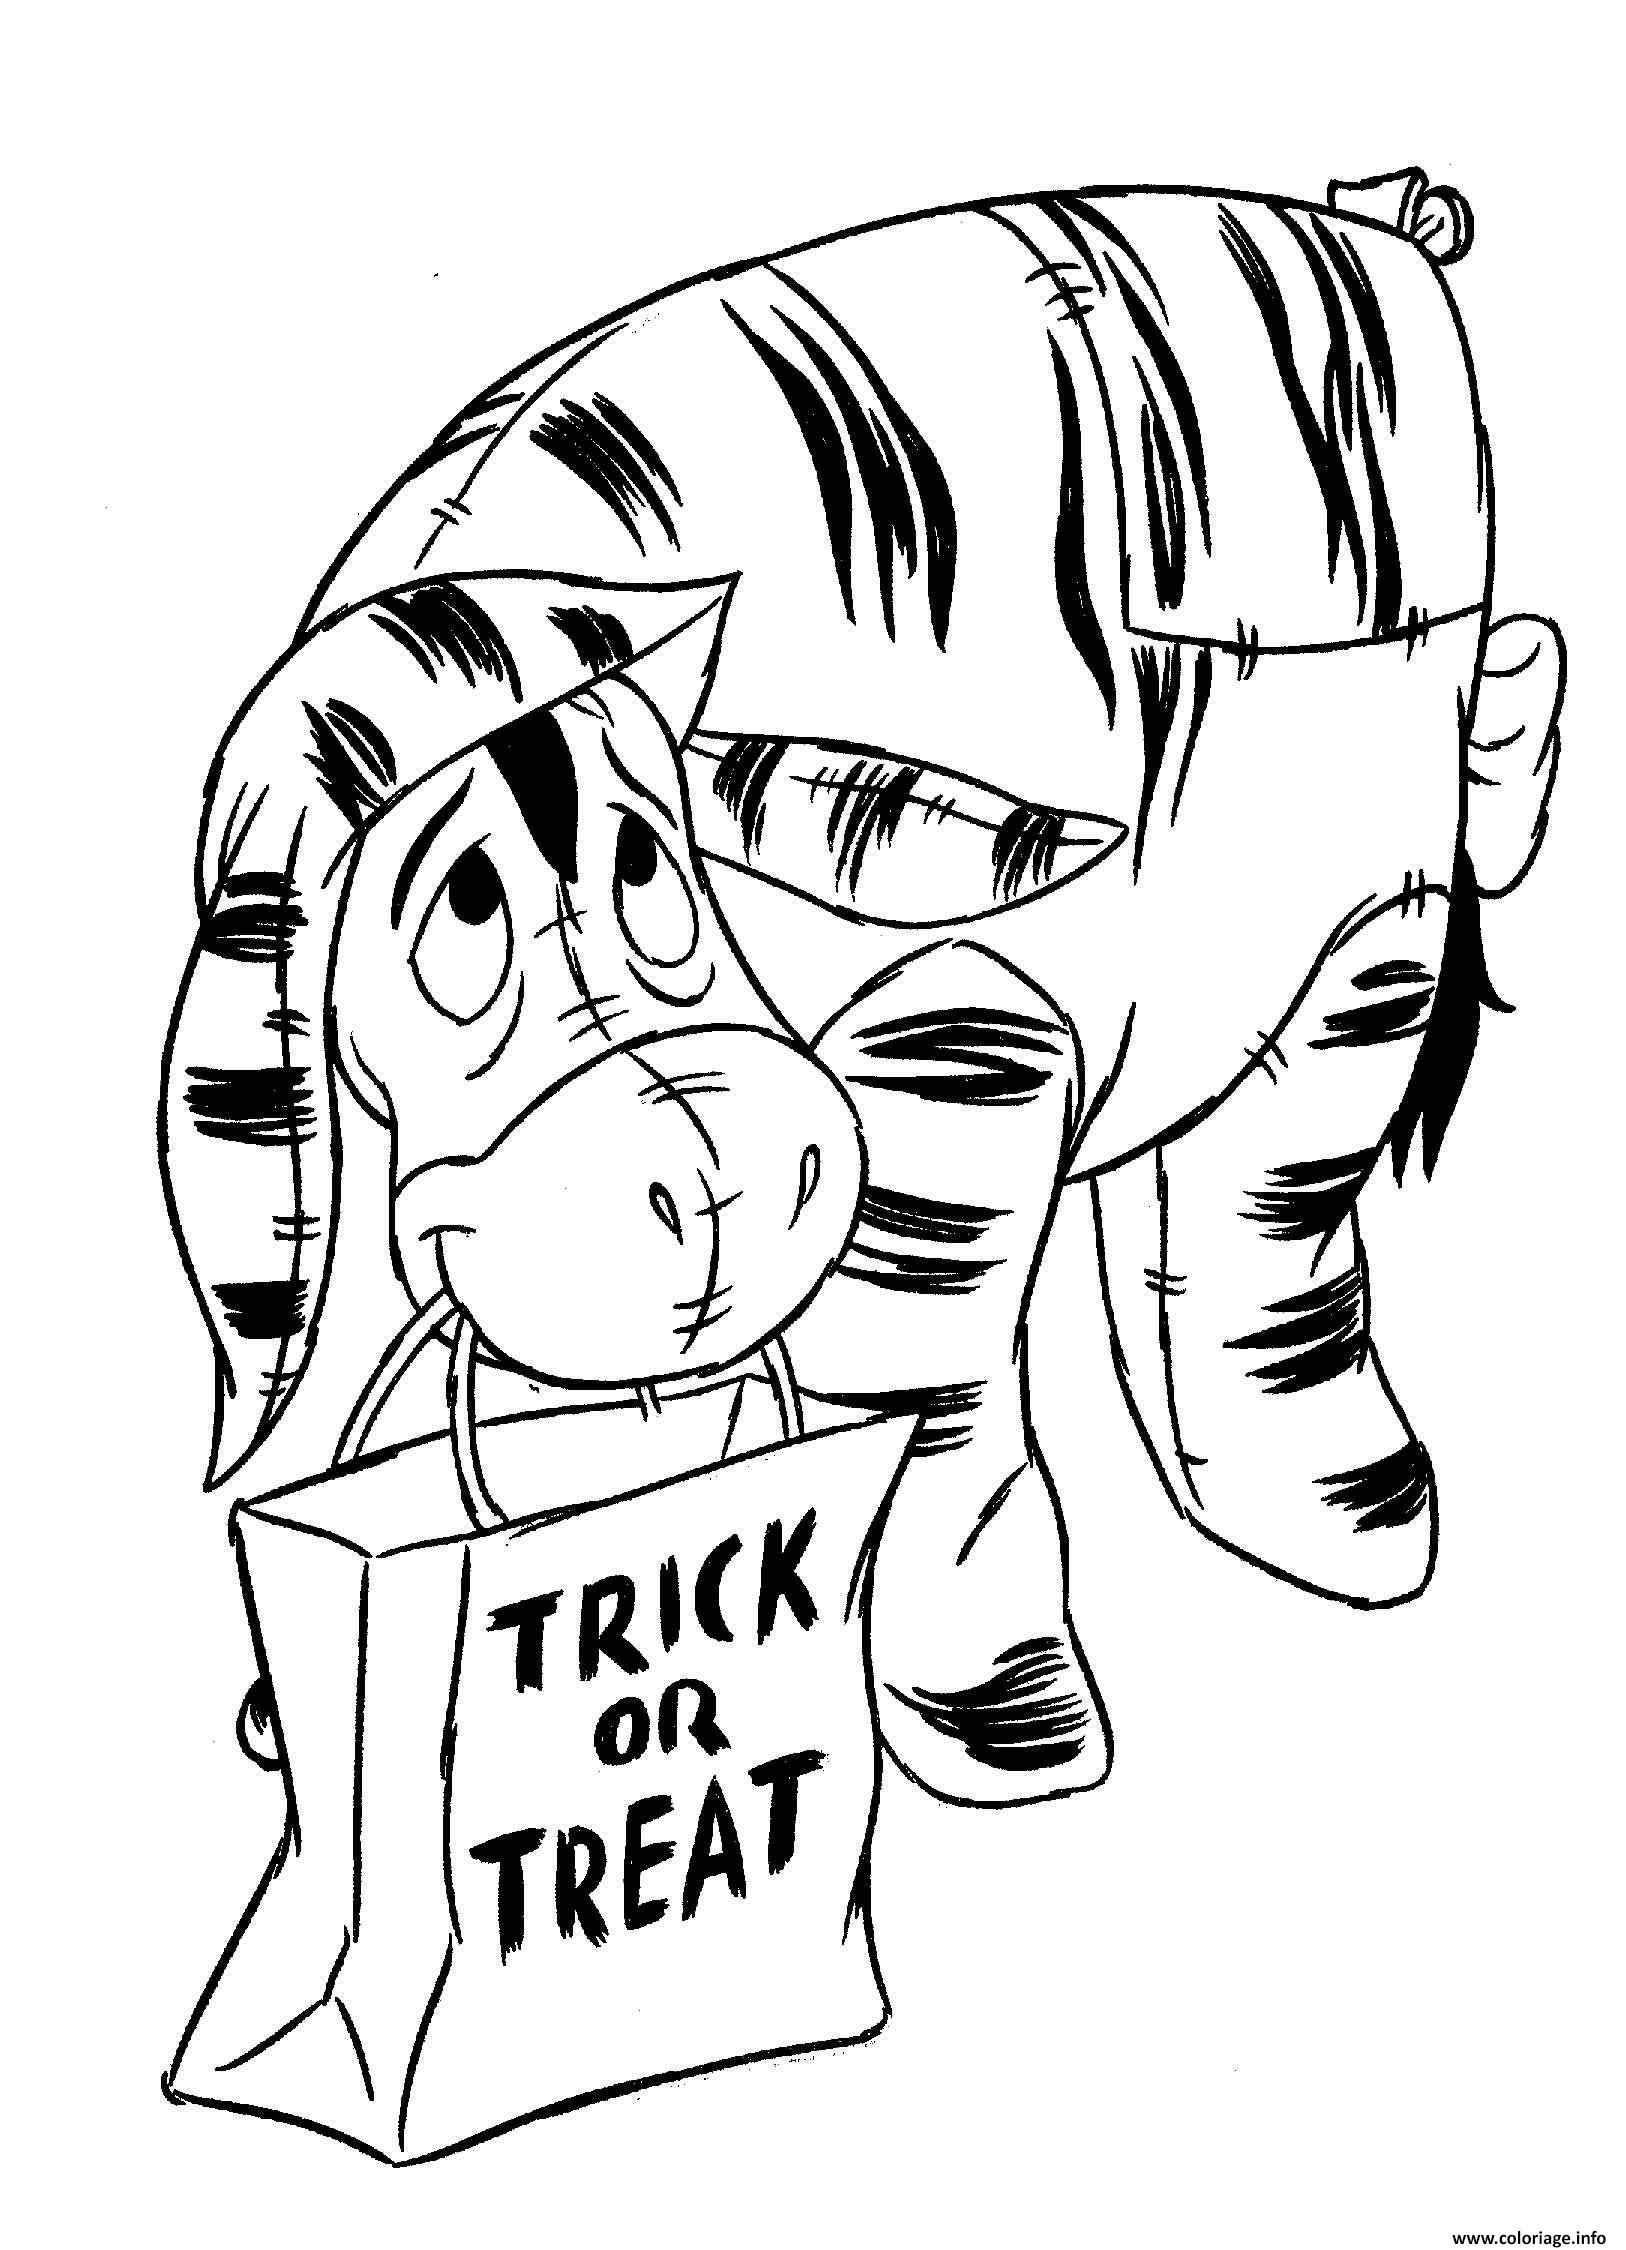 Dessin winnie the pooh halloween trick or treat Coloriage Gratuit à Imprimer